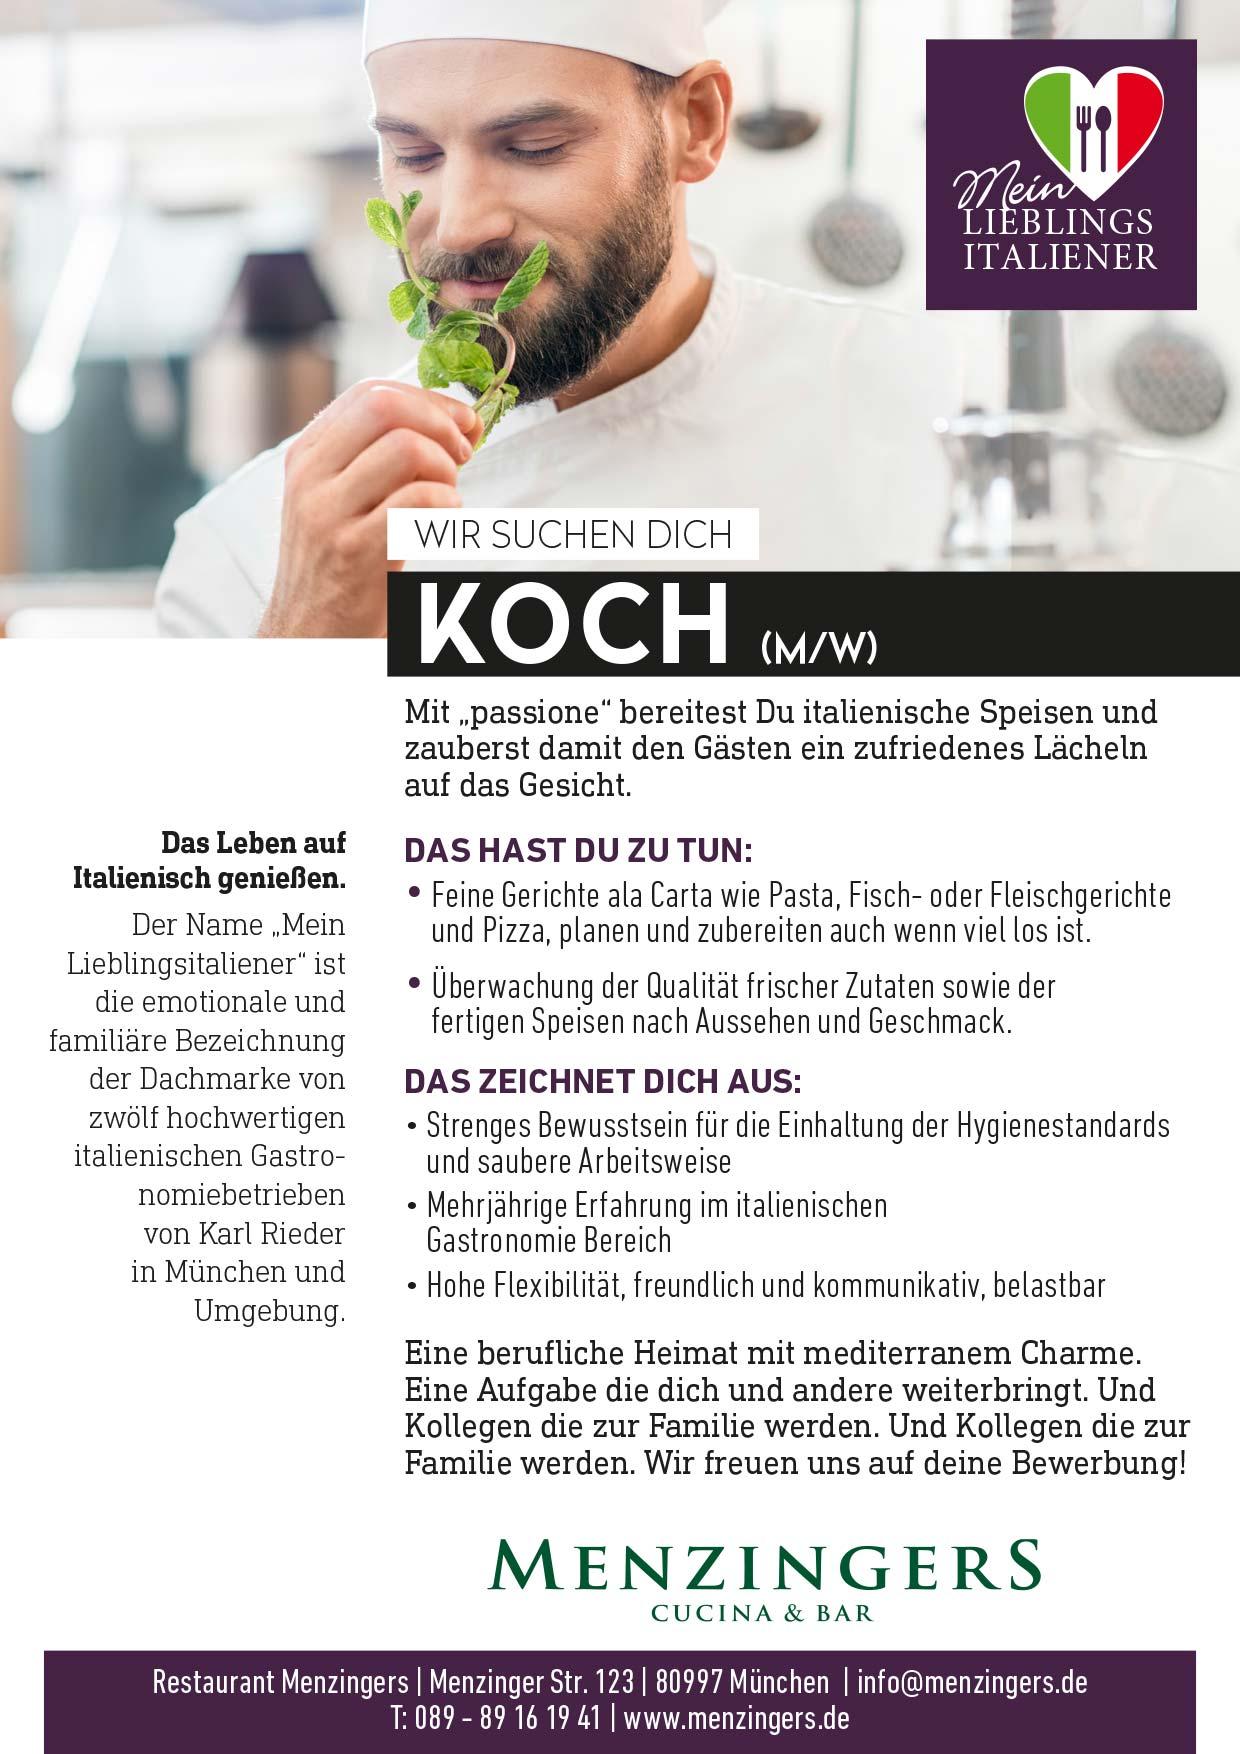 __stellenanzeigen_KOCH_Menzingers[1]